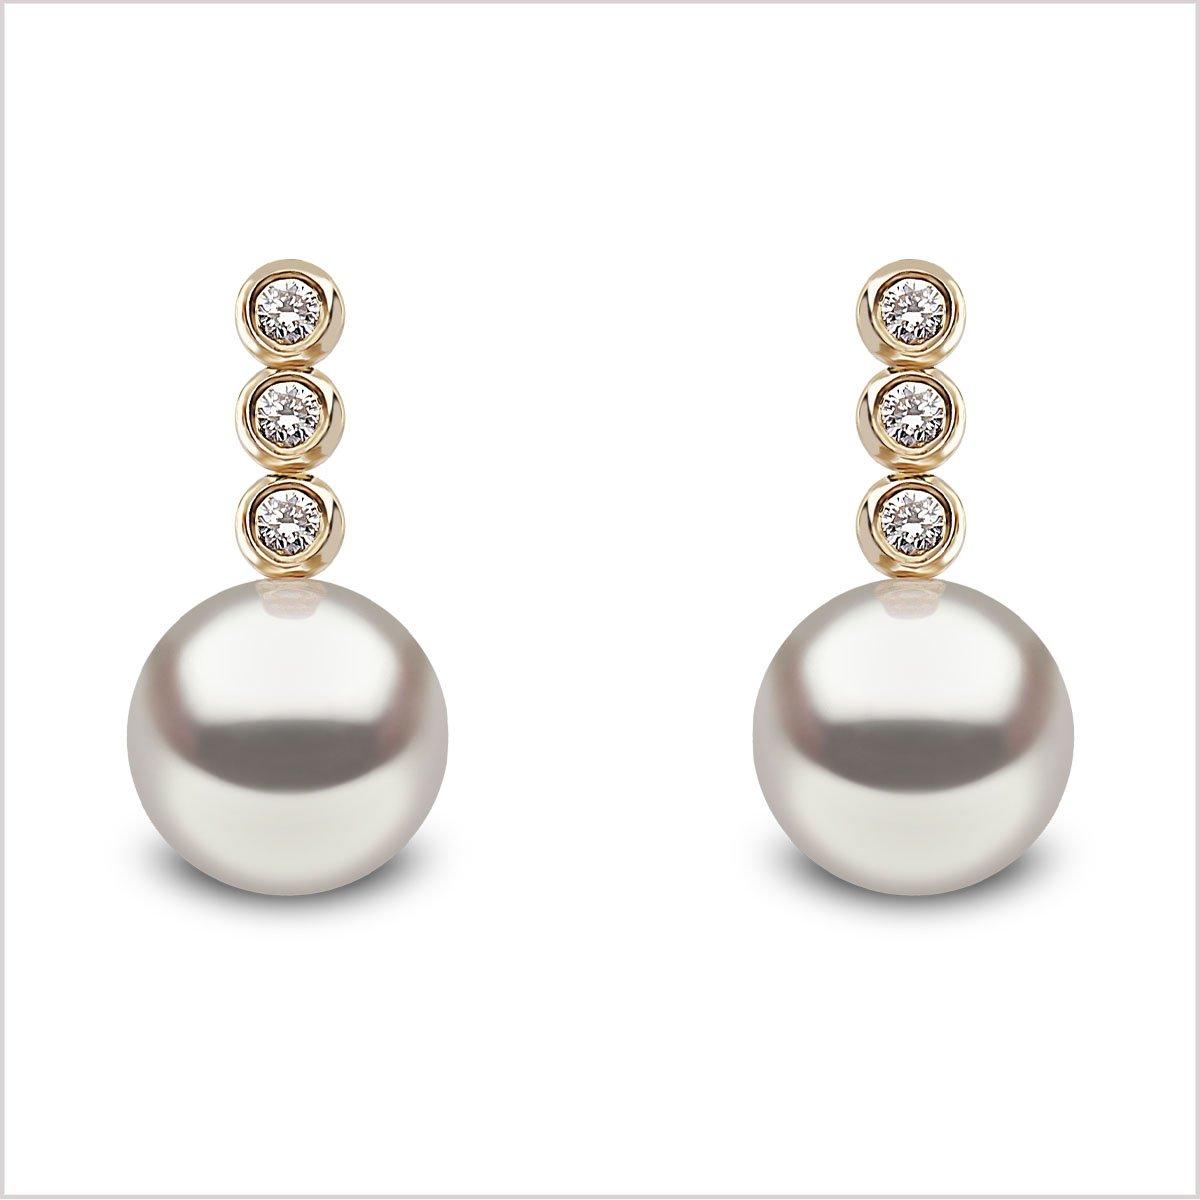 Yoko London Classic Freshwater Pearl & Diamond Earrings